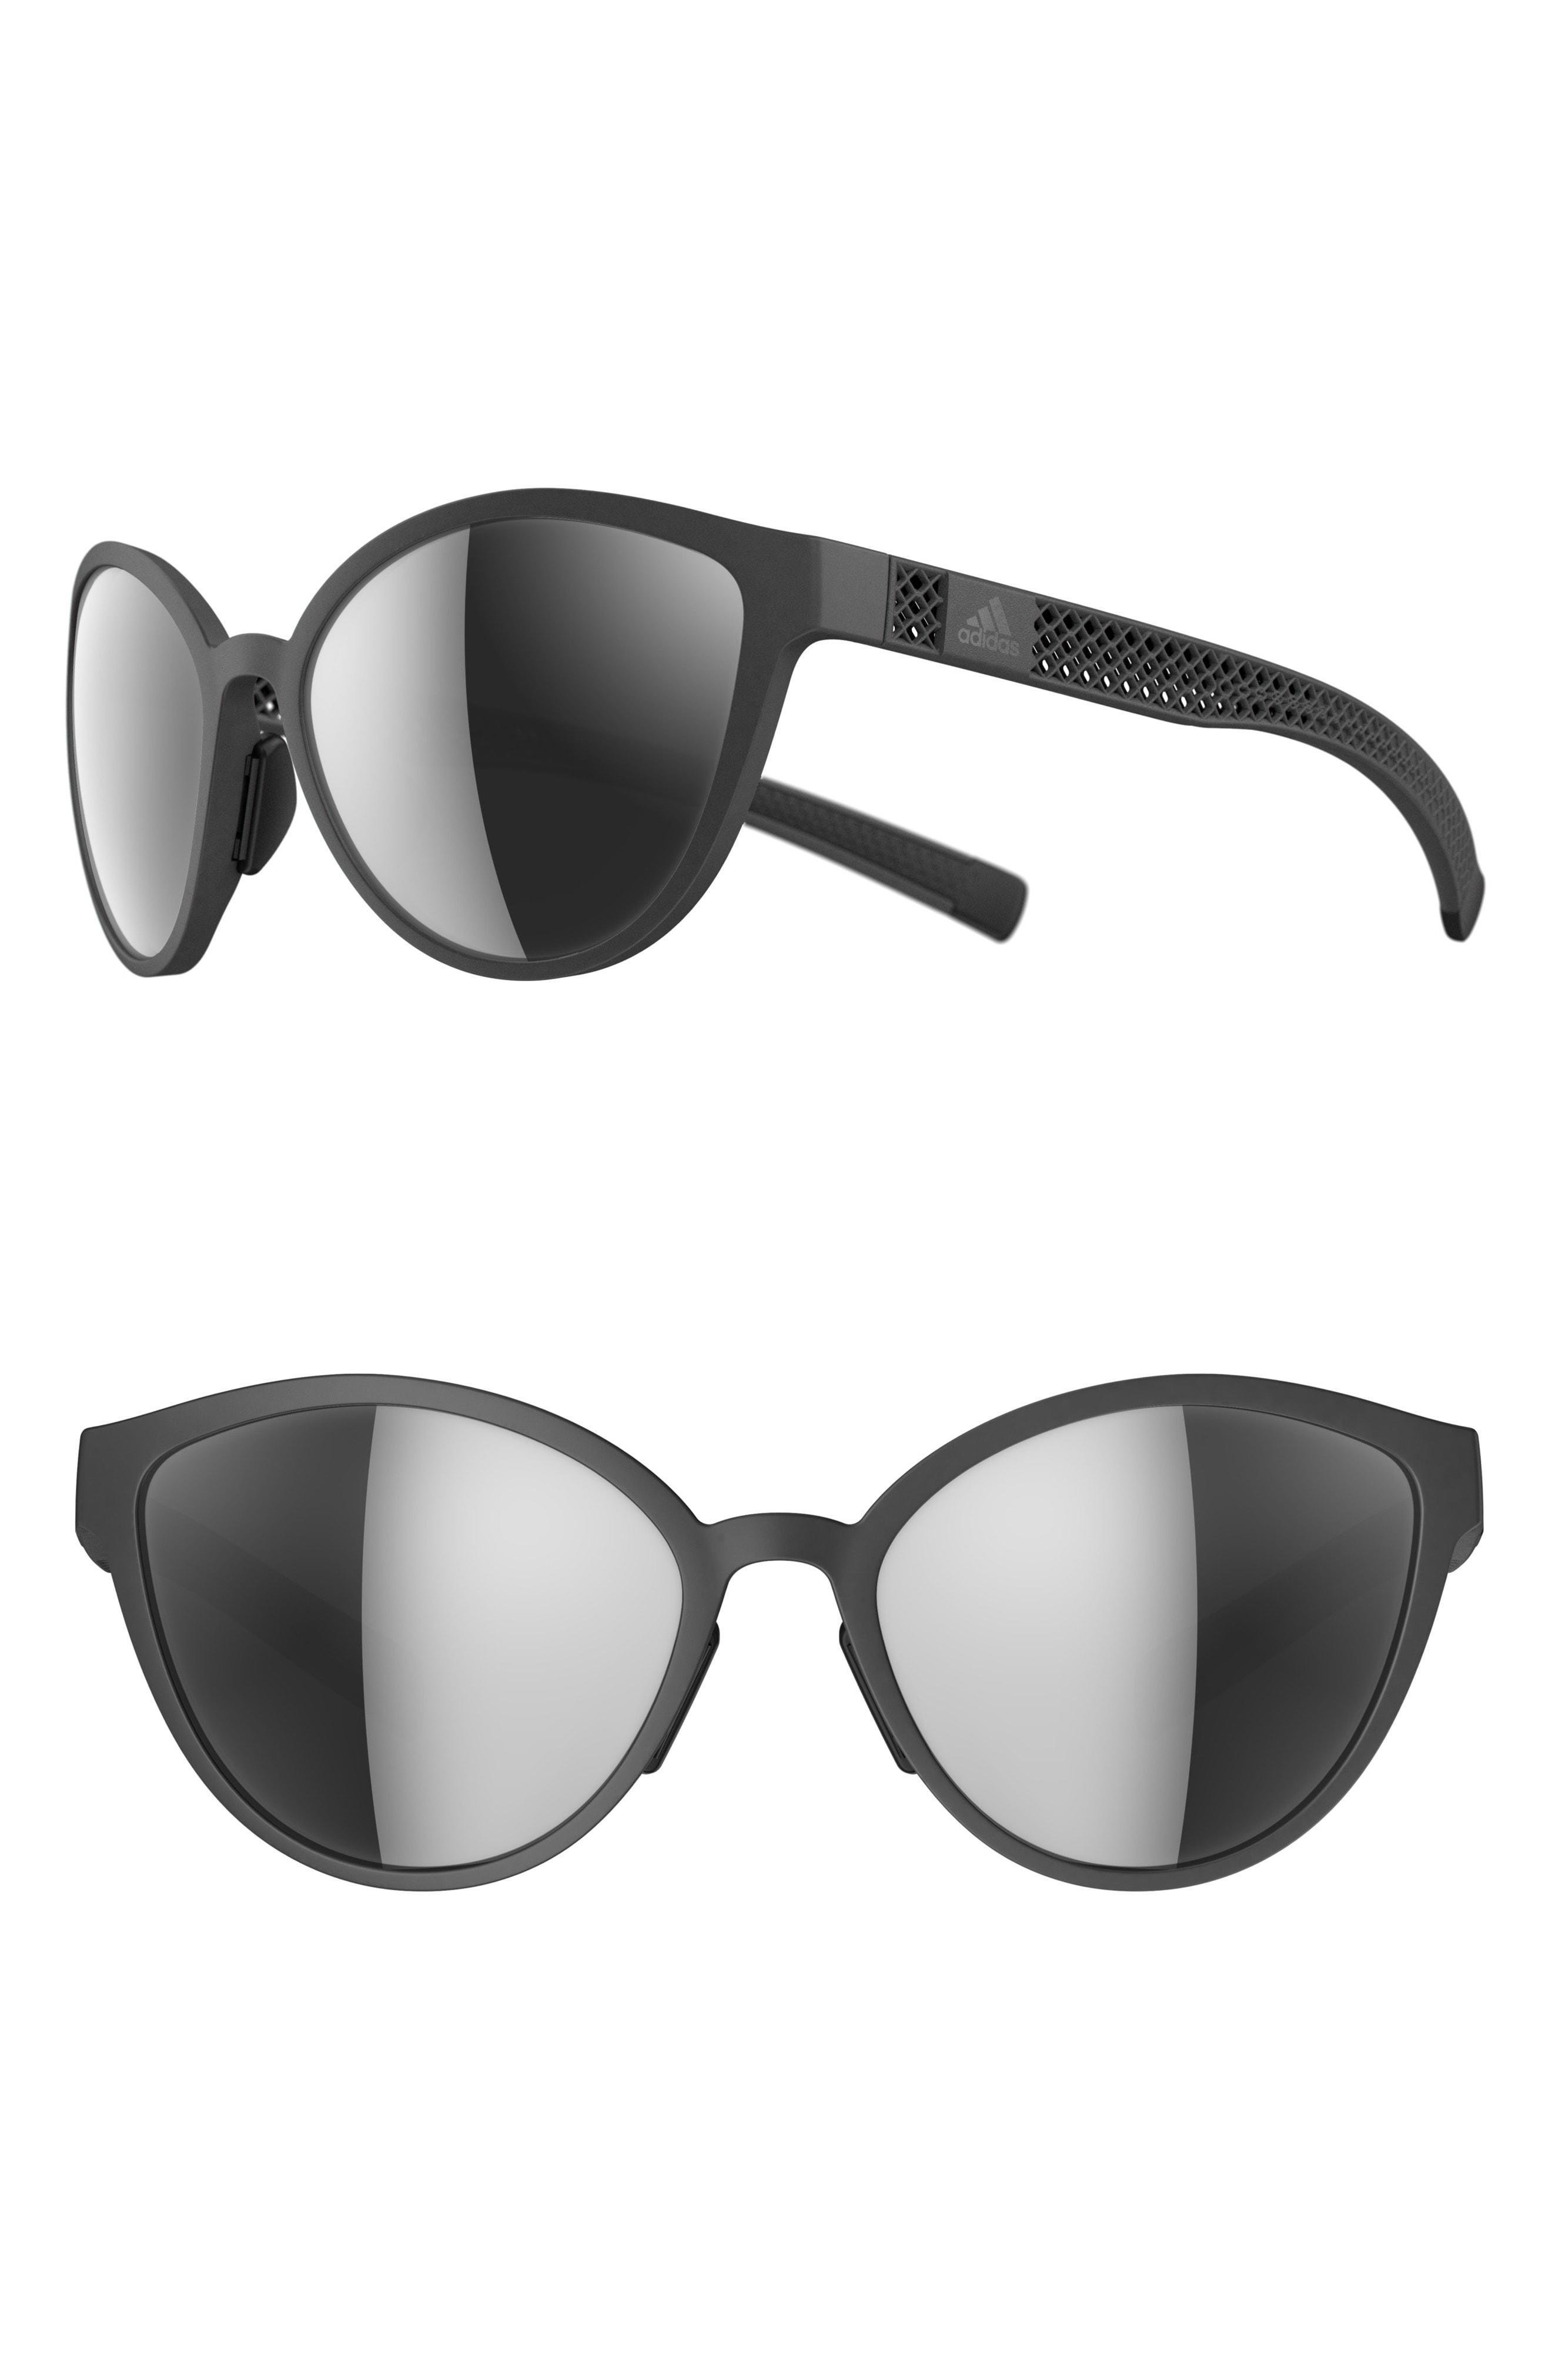 ac16ad73eb adidas. Women s Tempest 3dx 56mm Mirrored Cat Eye Running Sunglasses